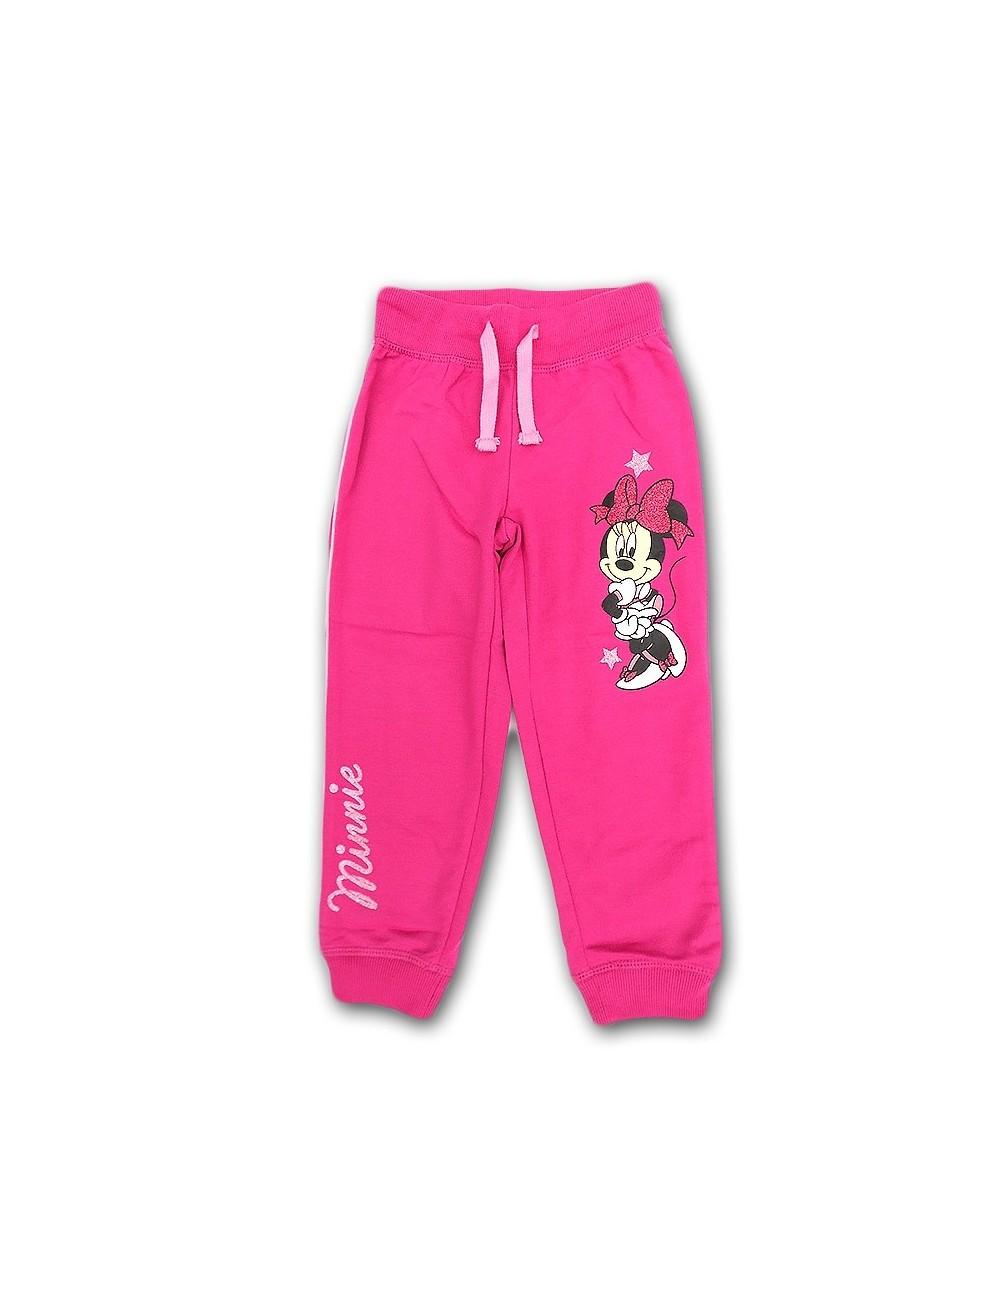 Pantaloni sport Minnie Mouse, roz, copii 3 - 8 ani